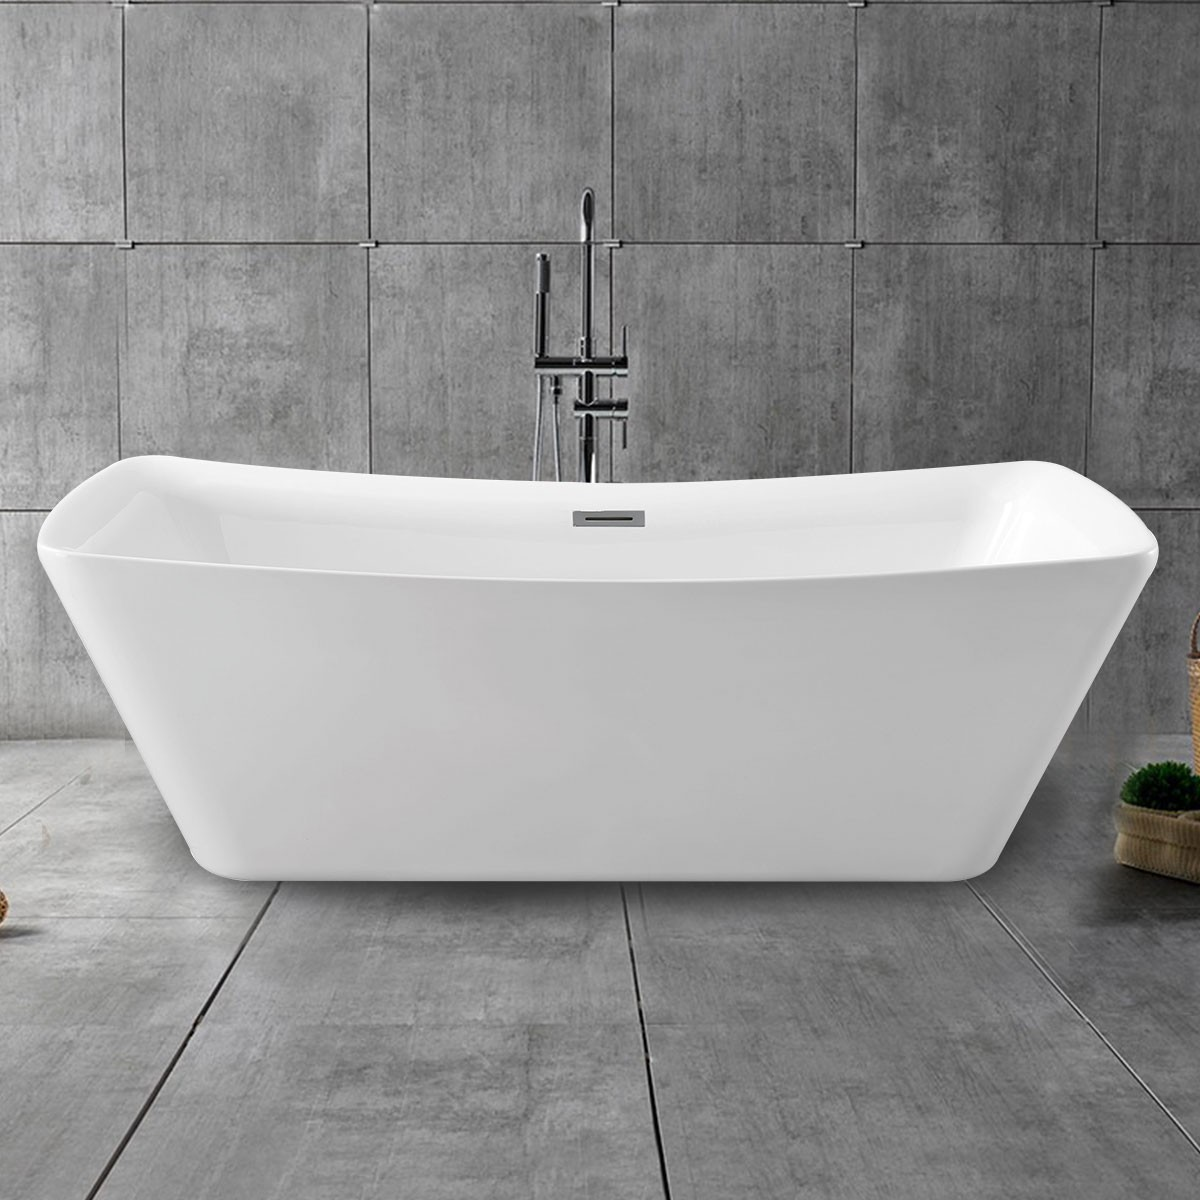 67 In Pure White Acrylic Freestanding Bathtub (DK-PW-4777)